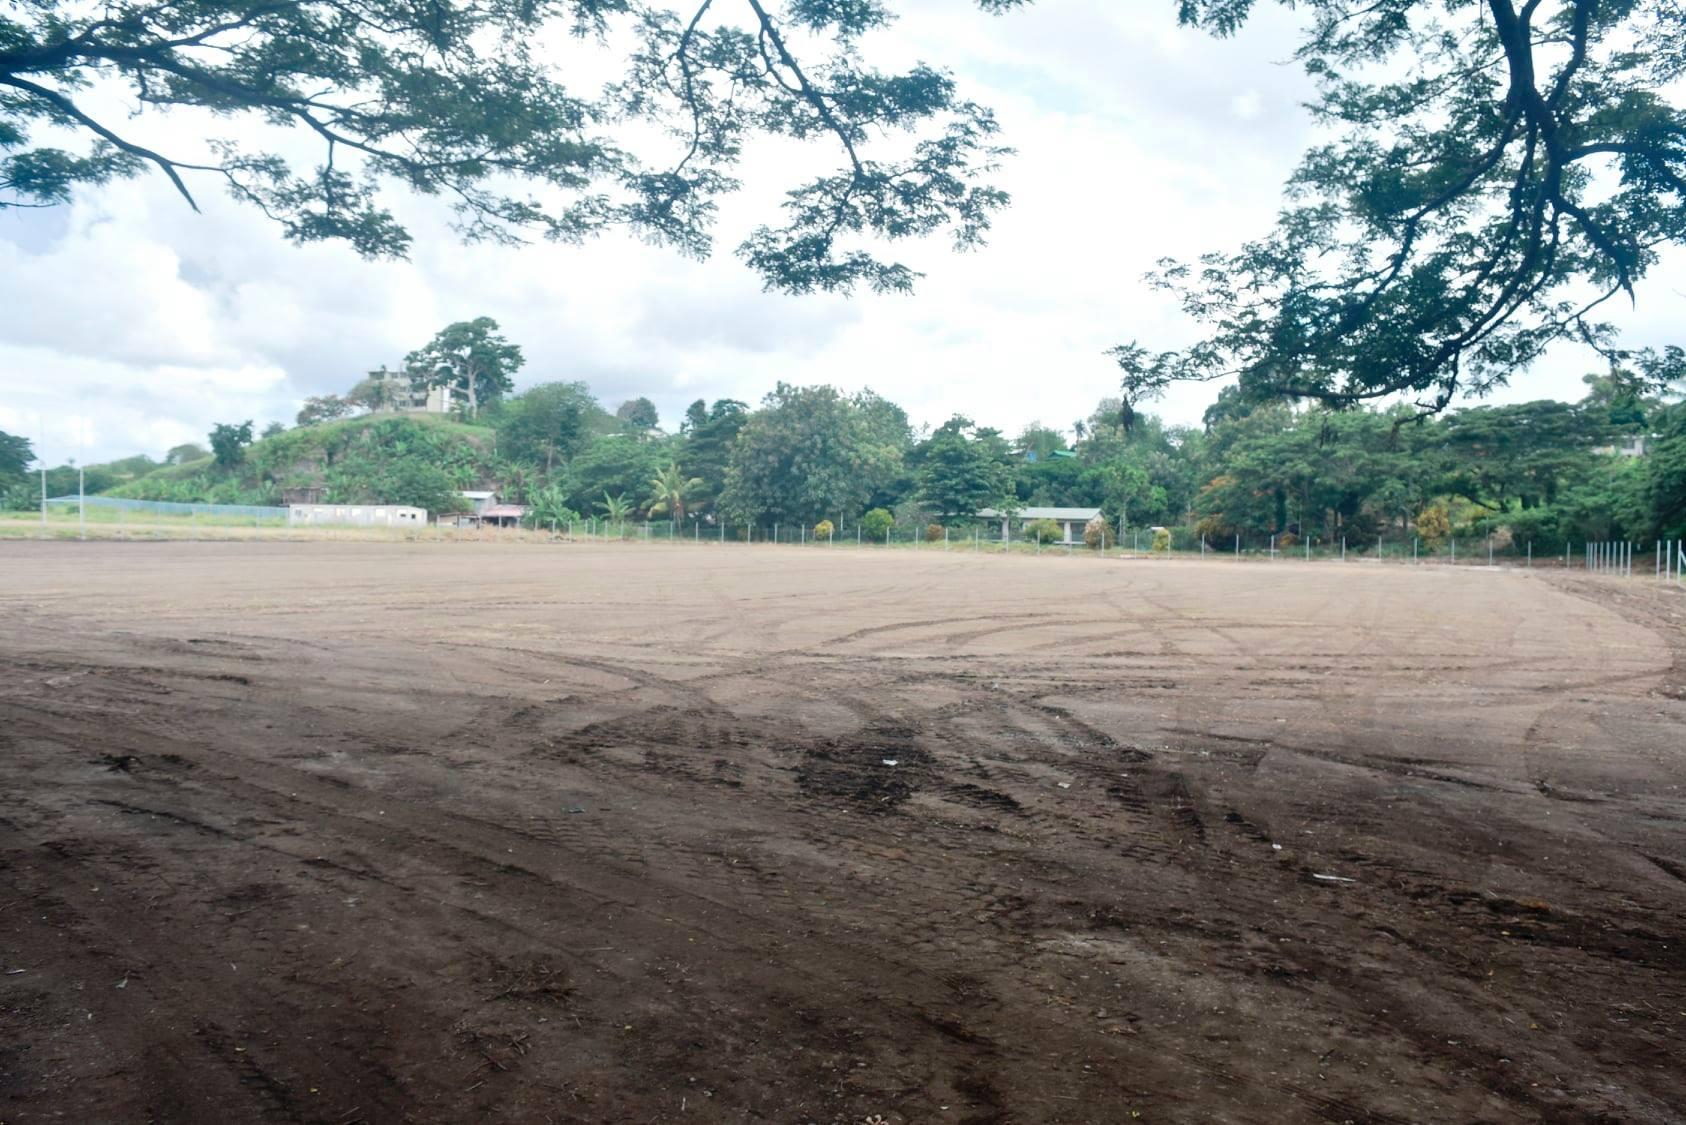 The Solomon Island's futsal facility dream to commence construction in 2021